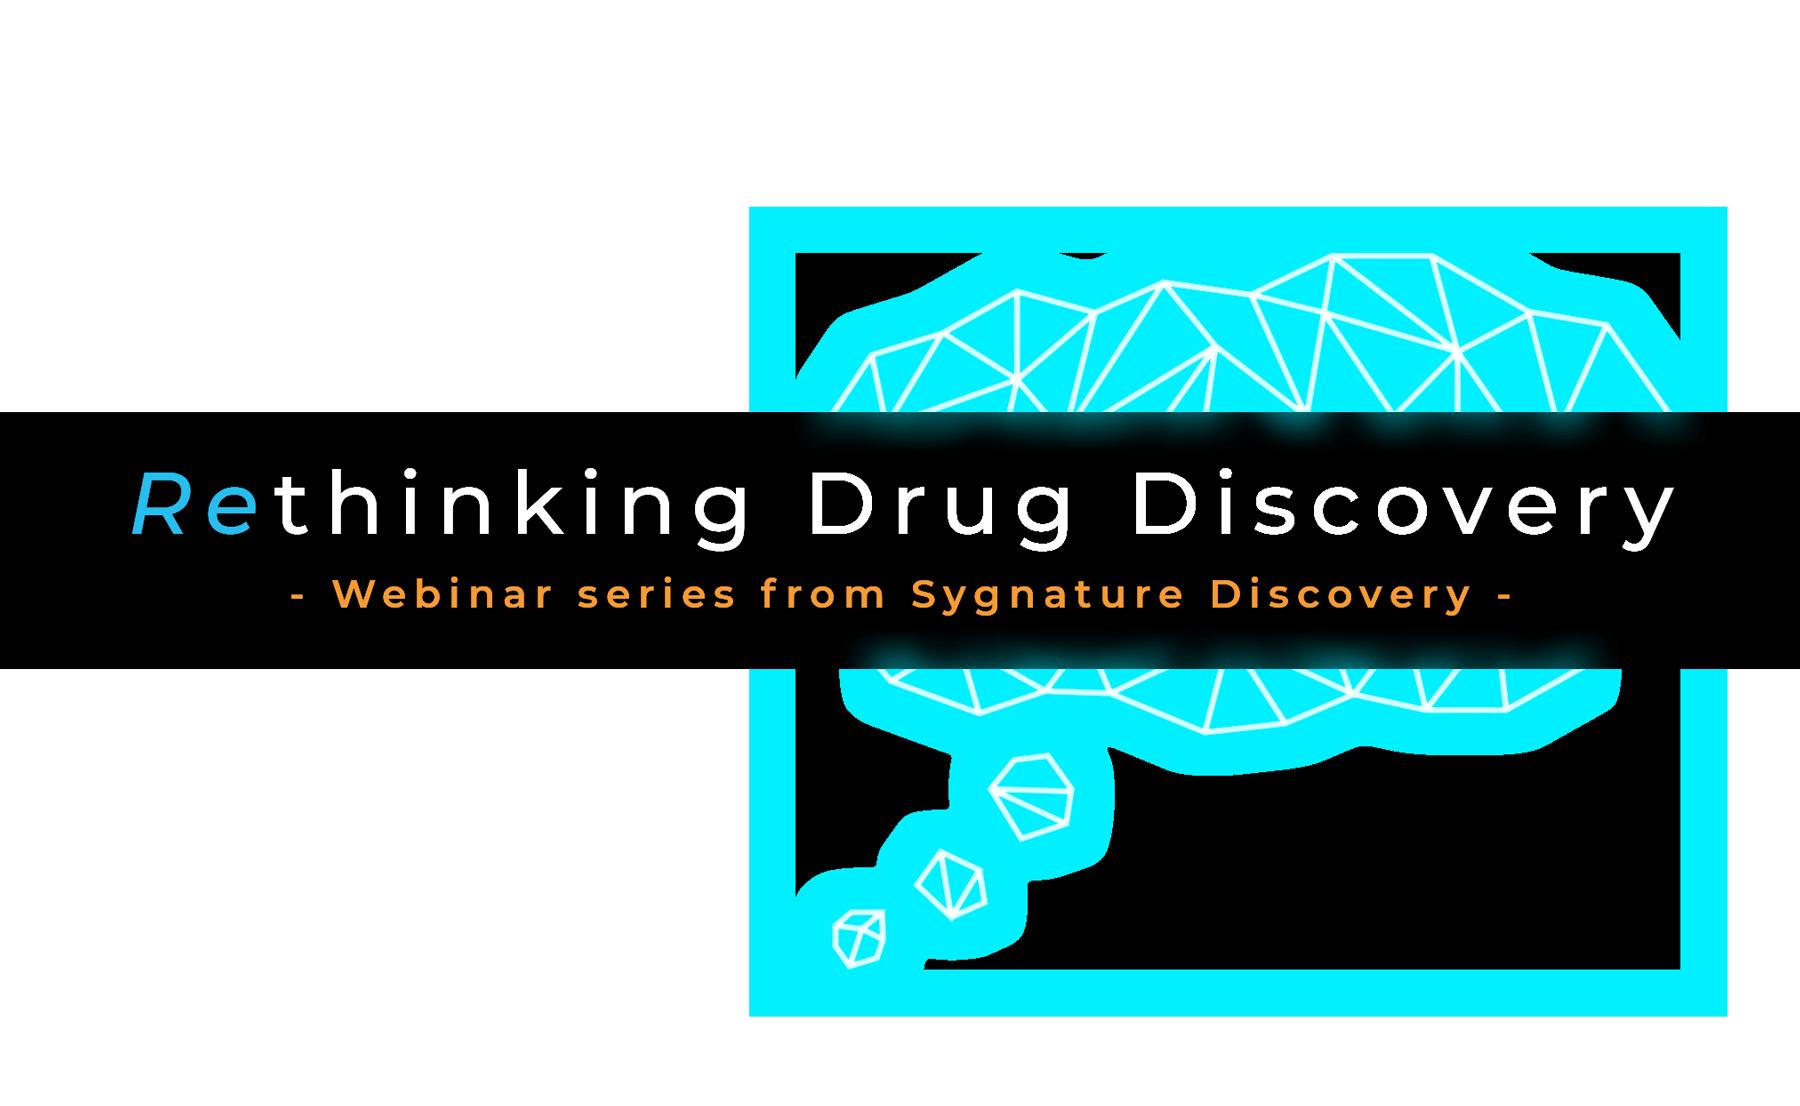 ReThinking Drug Discovery webinar series